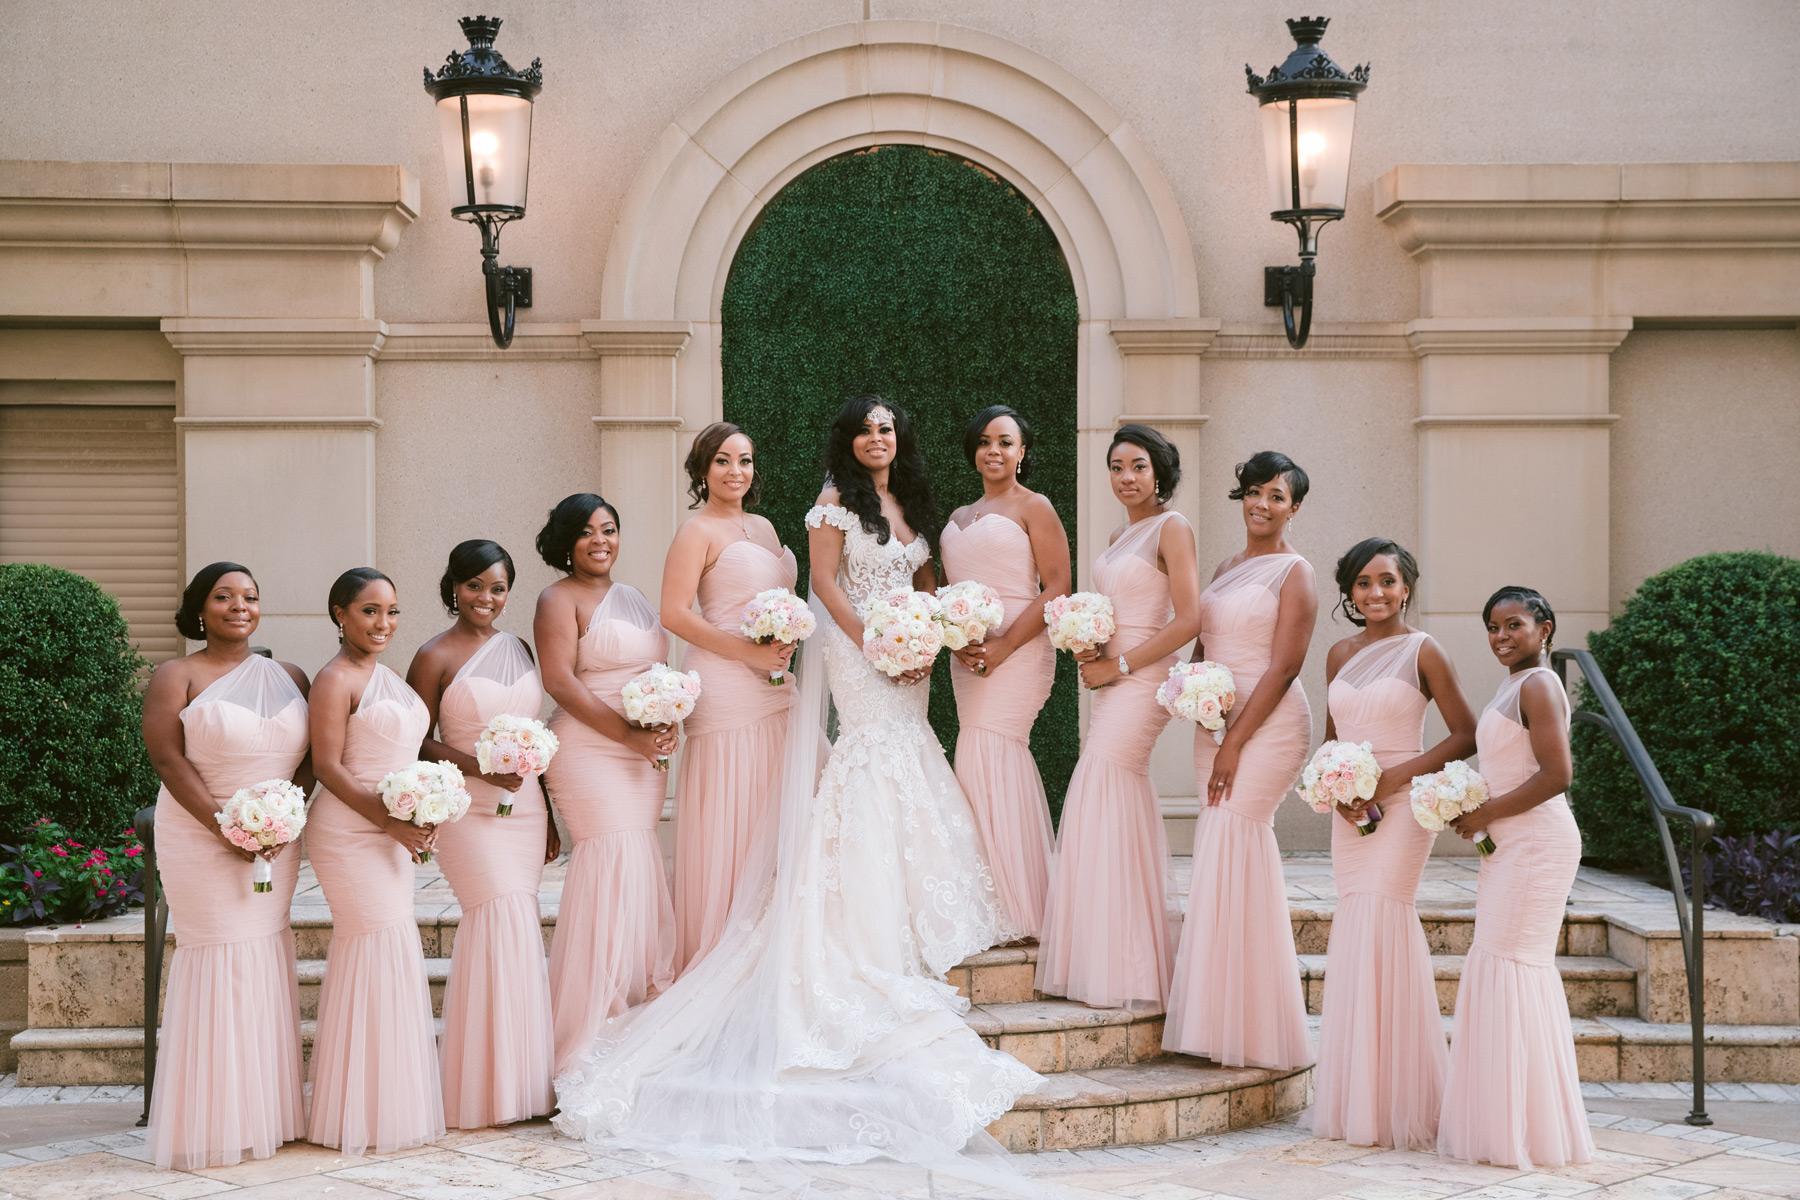 St-Regis-Wedding-Atlanta-0914-0058